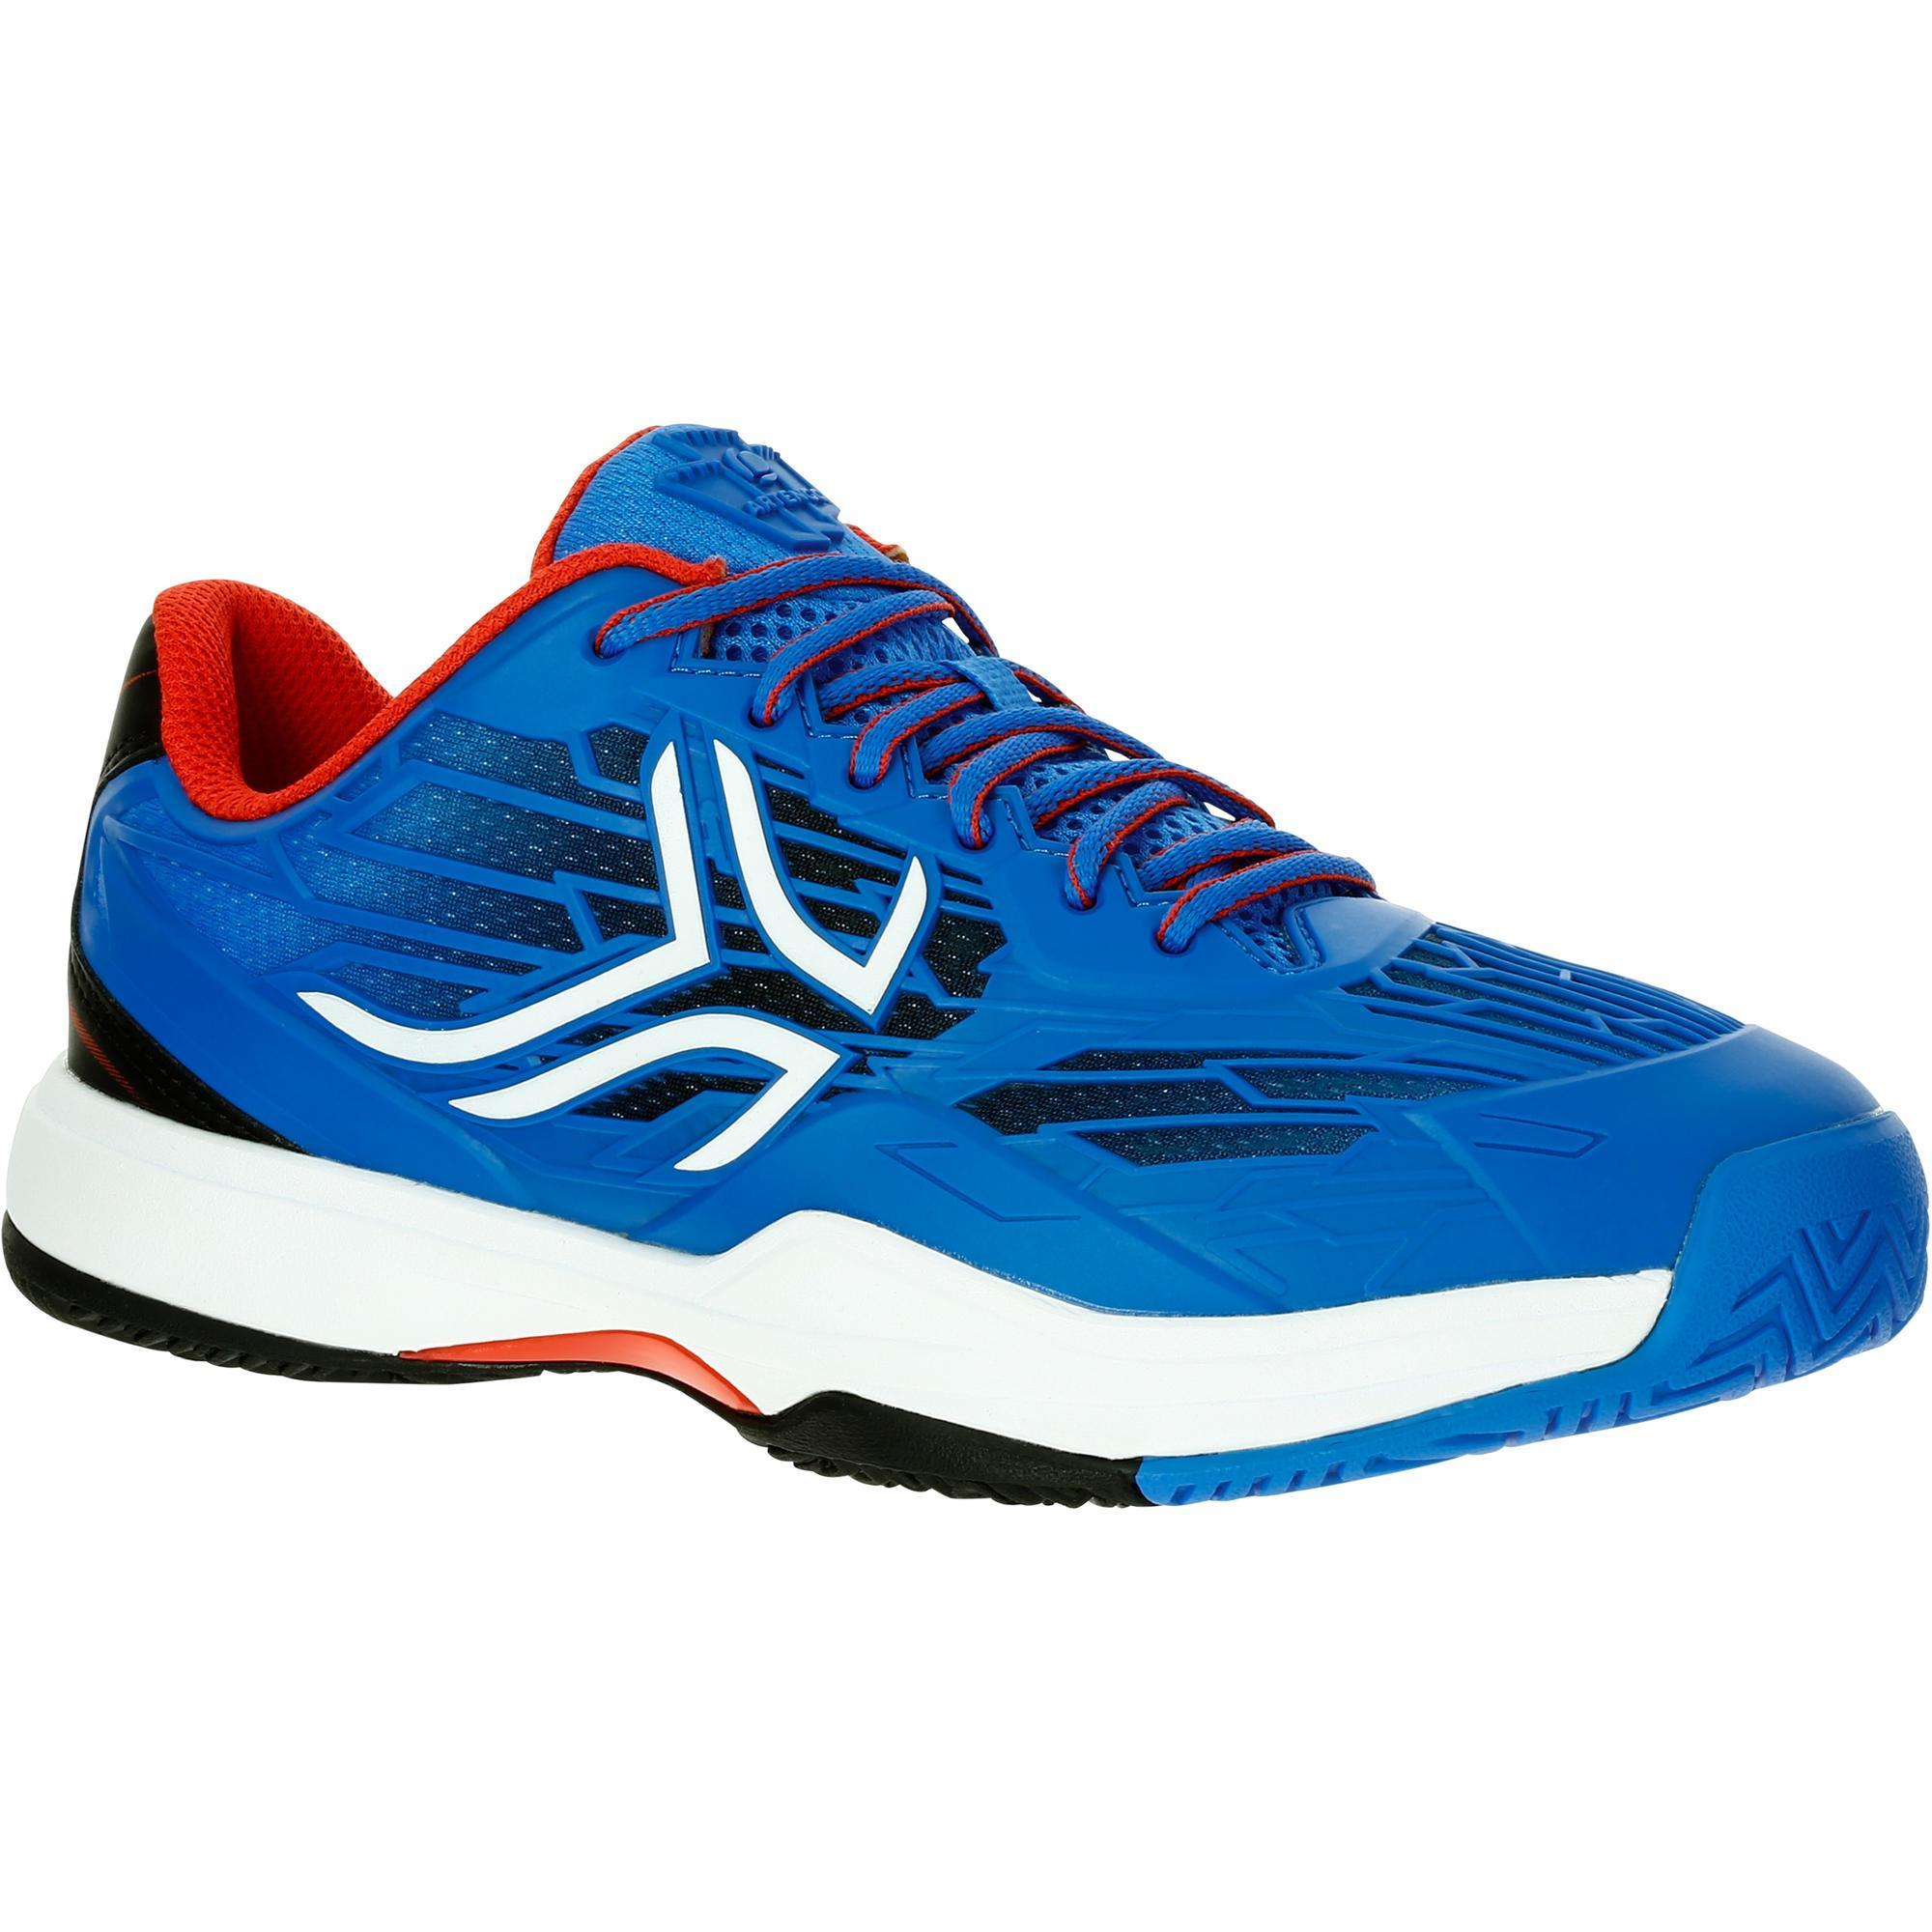 Artengo Tennisschoenen kinderen Artengo TS990 blauw